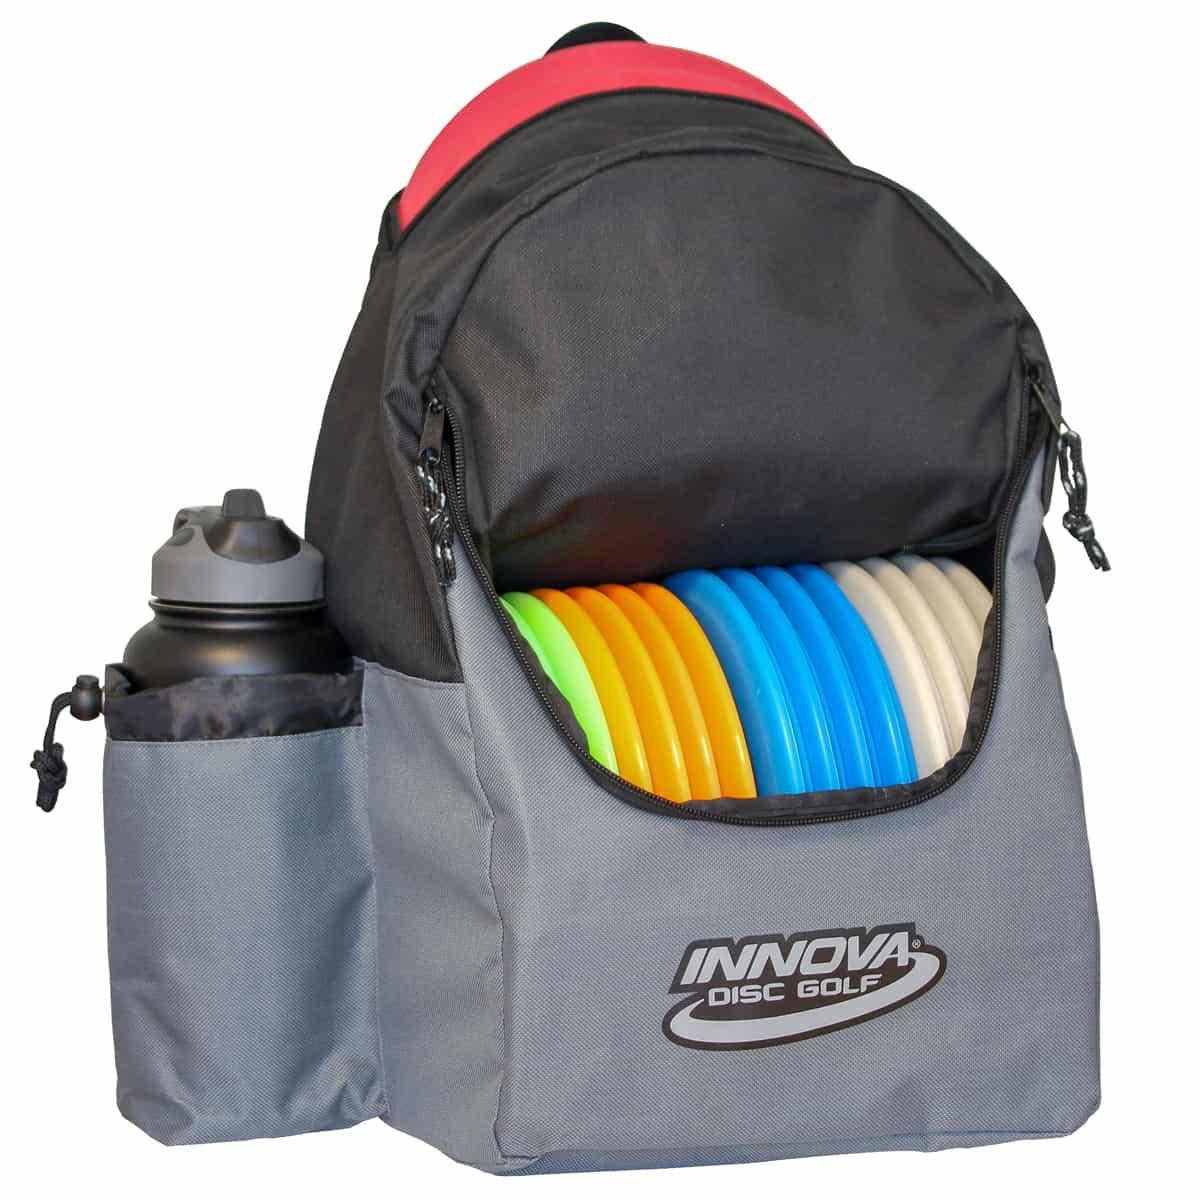 Innova  Discovery Backpack, Gray/Black